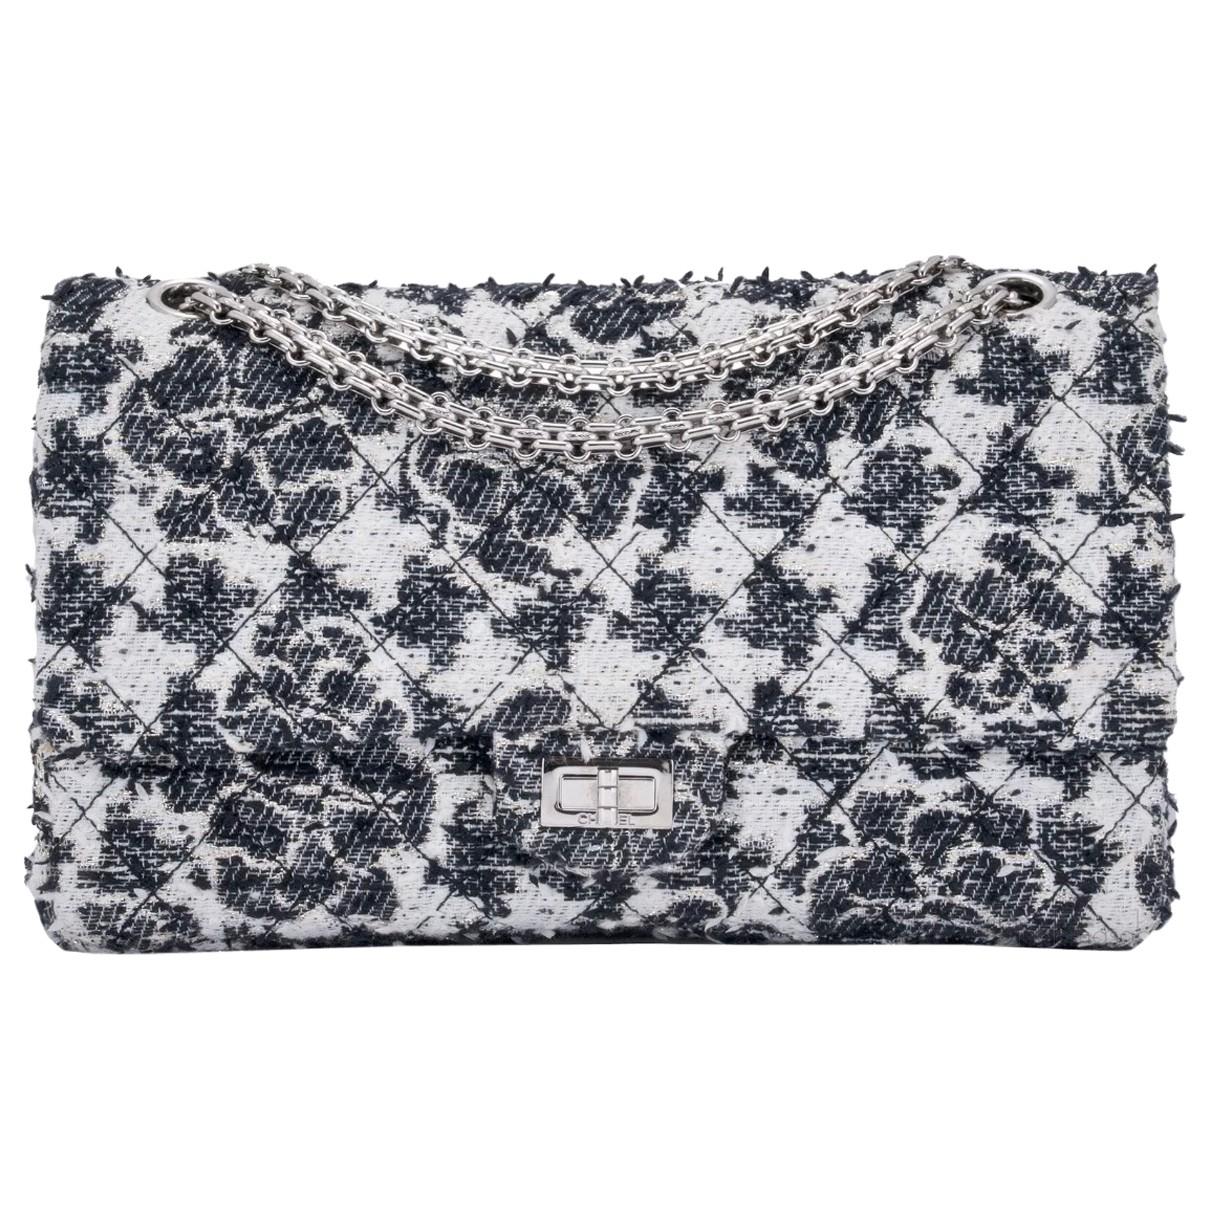 Chanel - Sac a main 2.55 pour femme en tweed - blanc